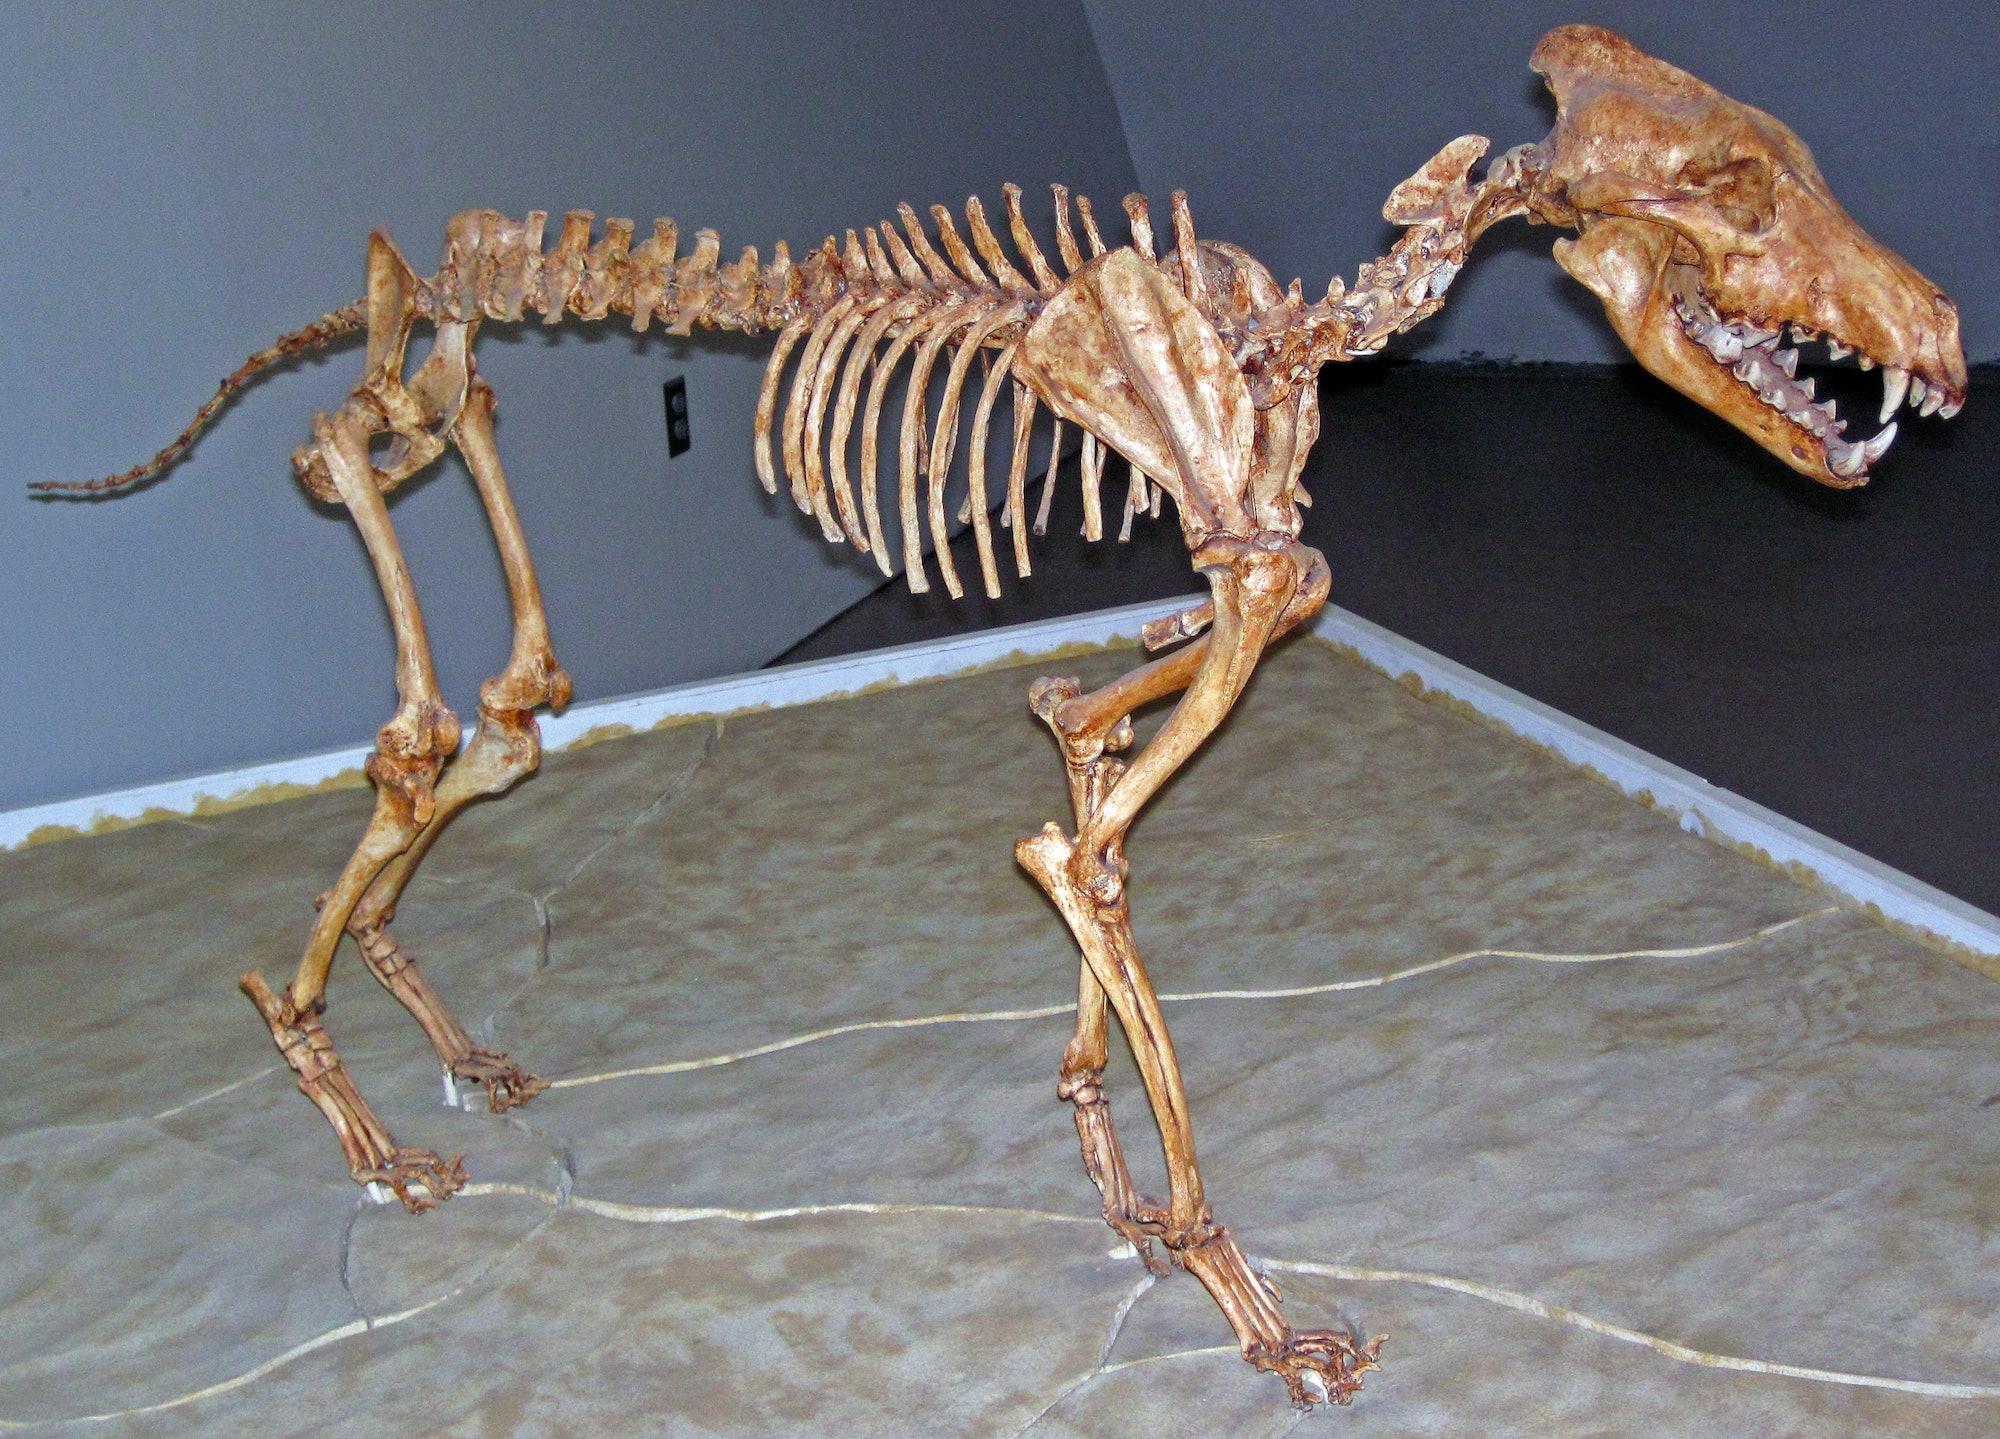 direwolf skeleton de-extinction prehistoric animal Game of Thrones